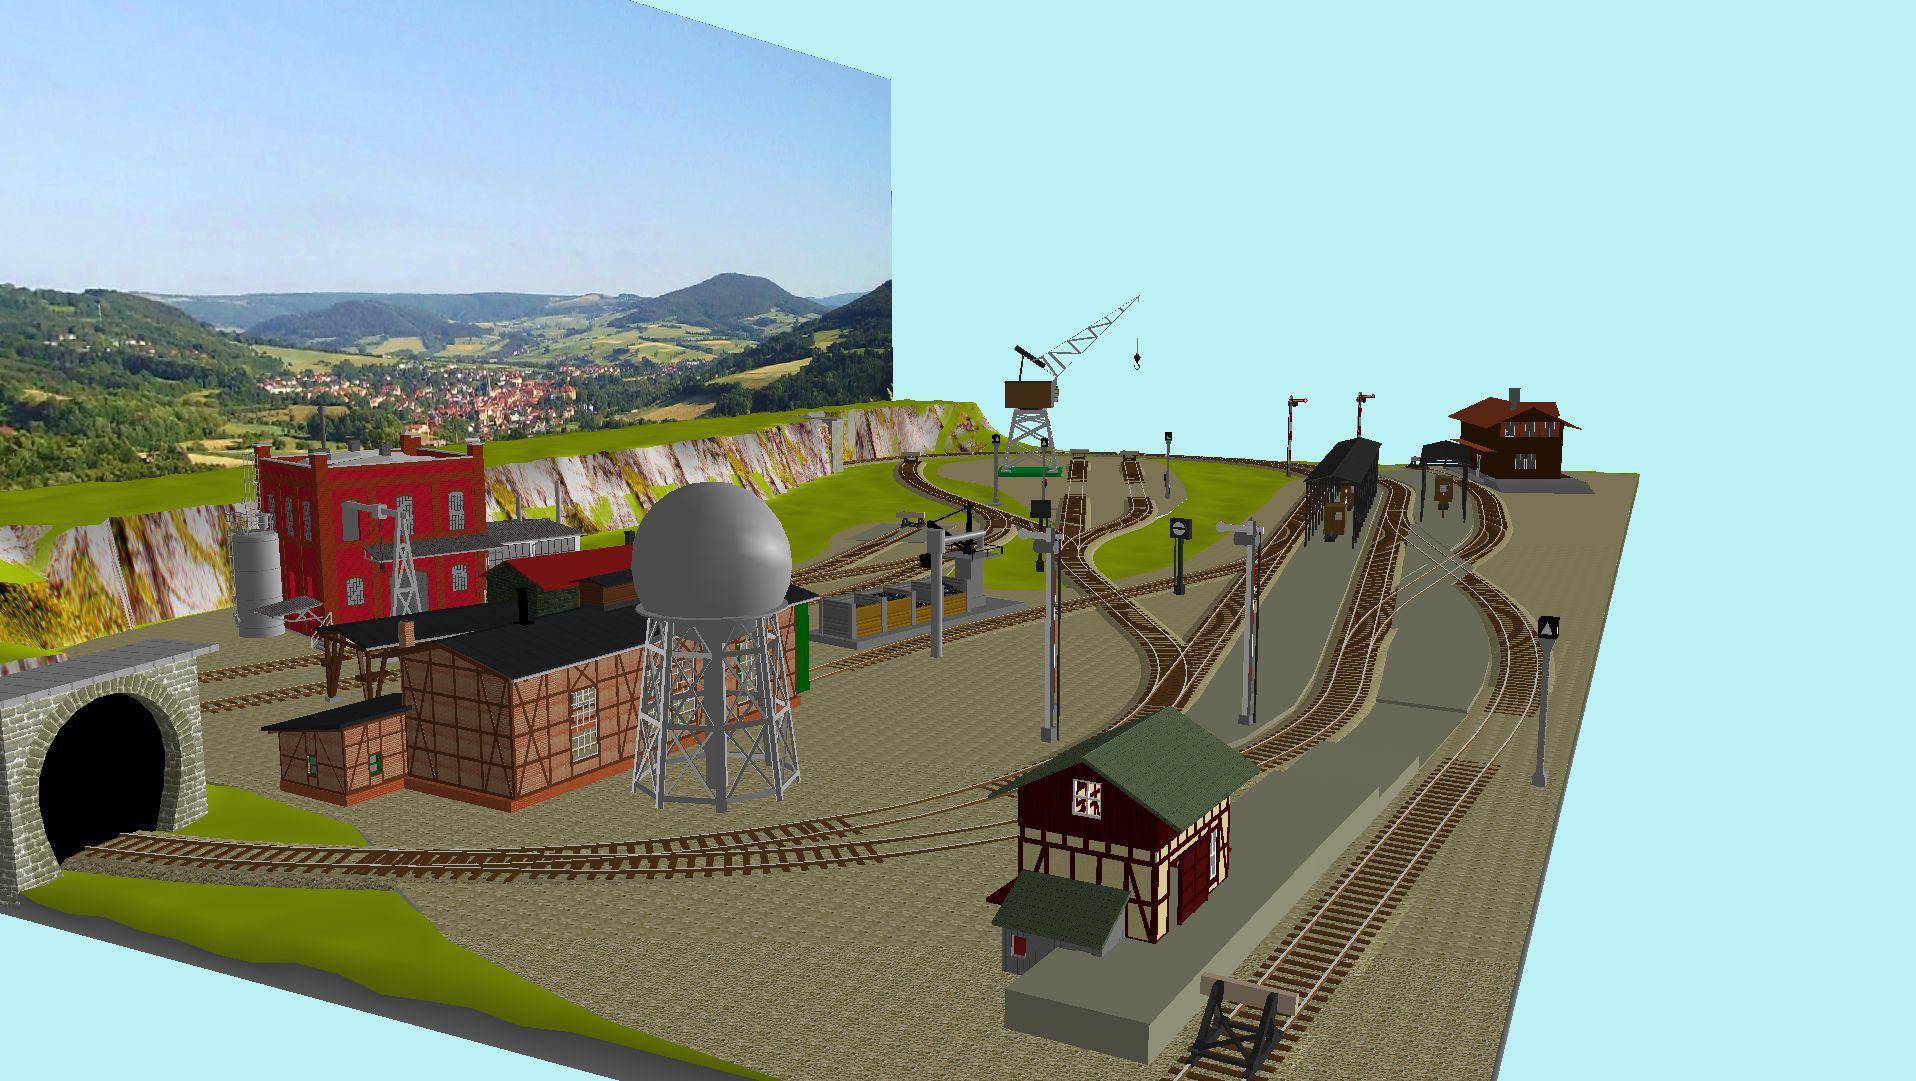 'ALBA Modellbahnpraxis' Band 1, Plan 5 Amp-1_5_c-gleis_freilthkr0